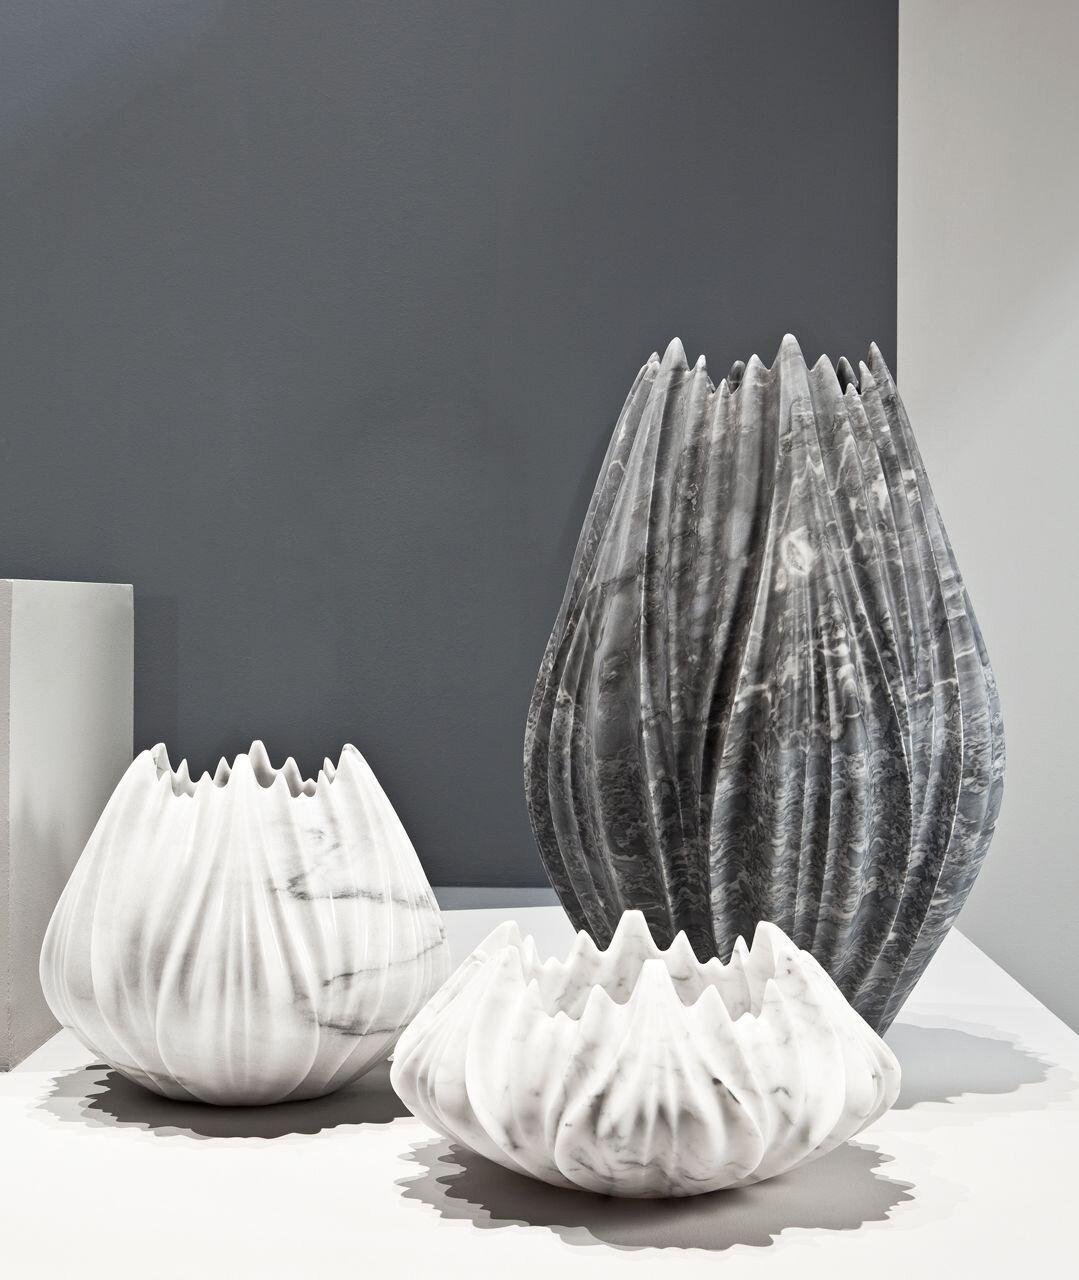 CITCO Sculptural Vases from Zaha Hadid